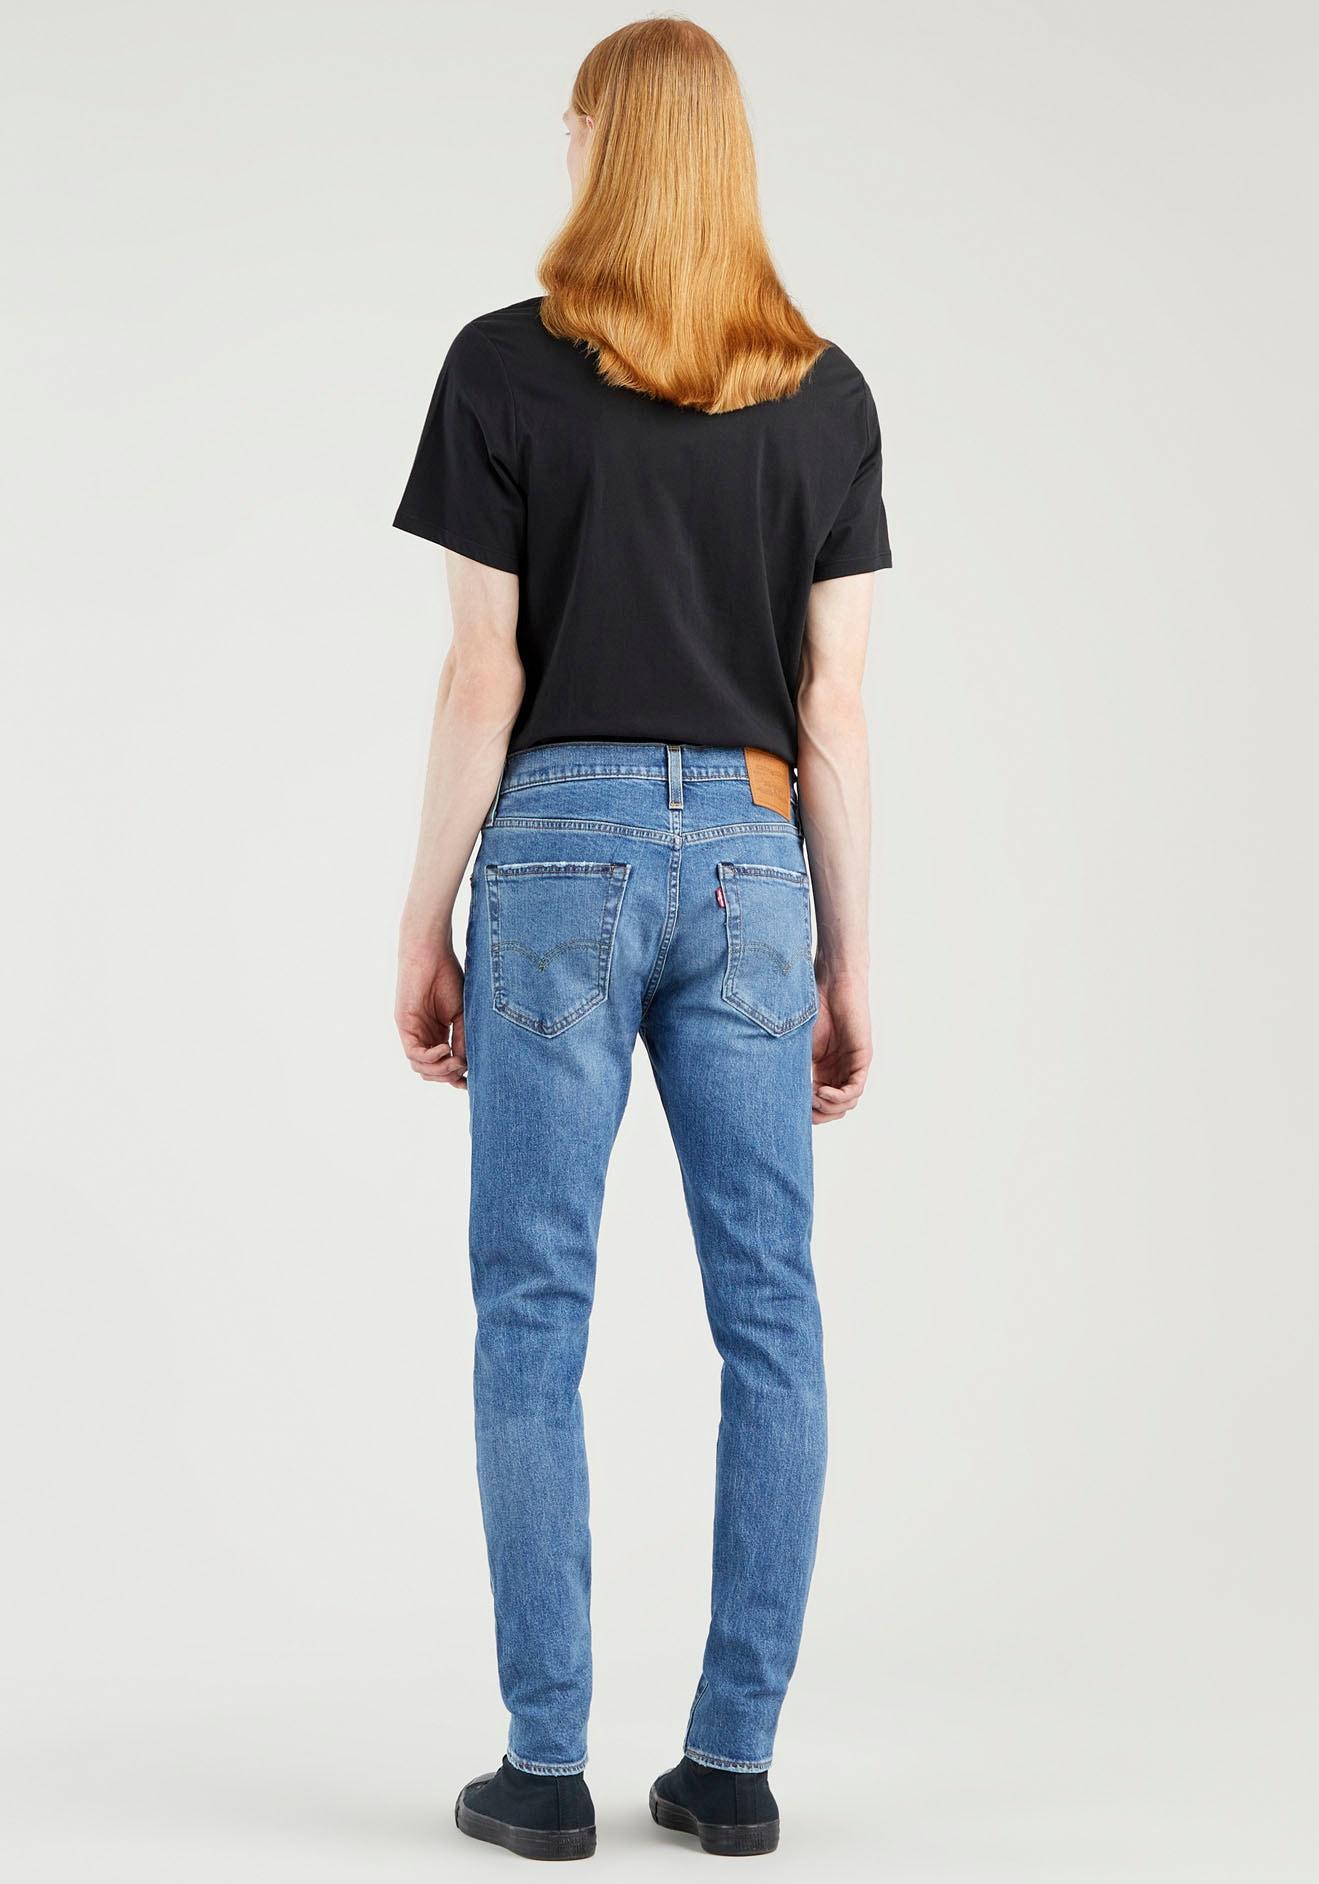 levis - Levi's Skinny-fit-Jeans SKINNY TAPER, mit Markenlabel